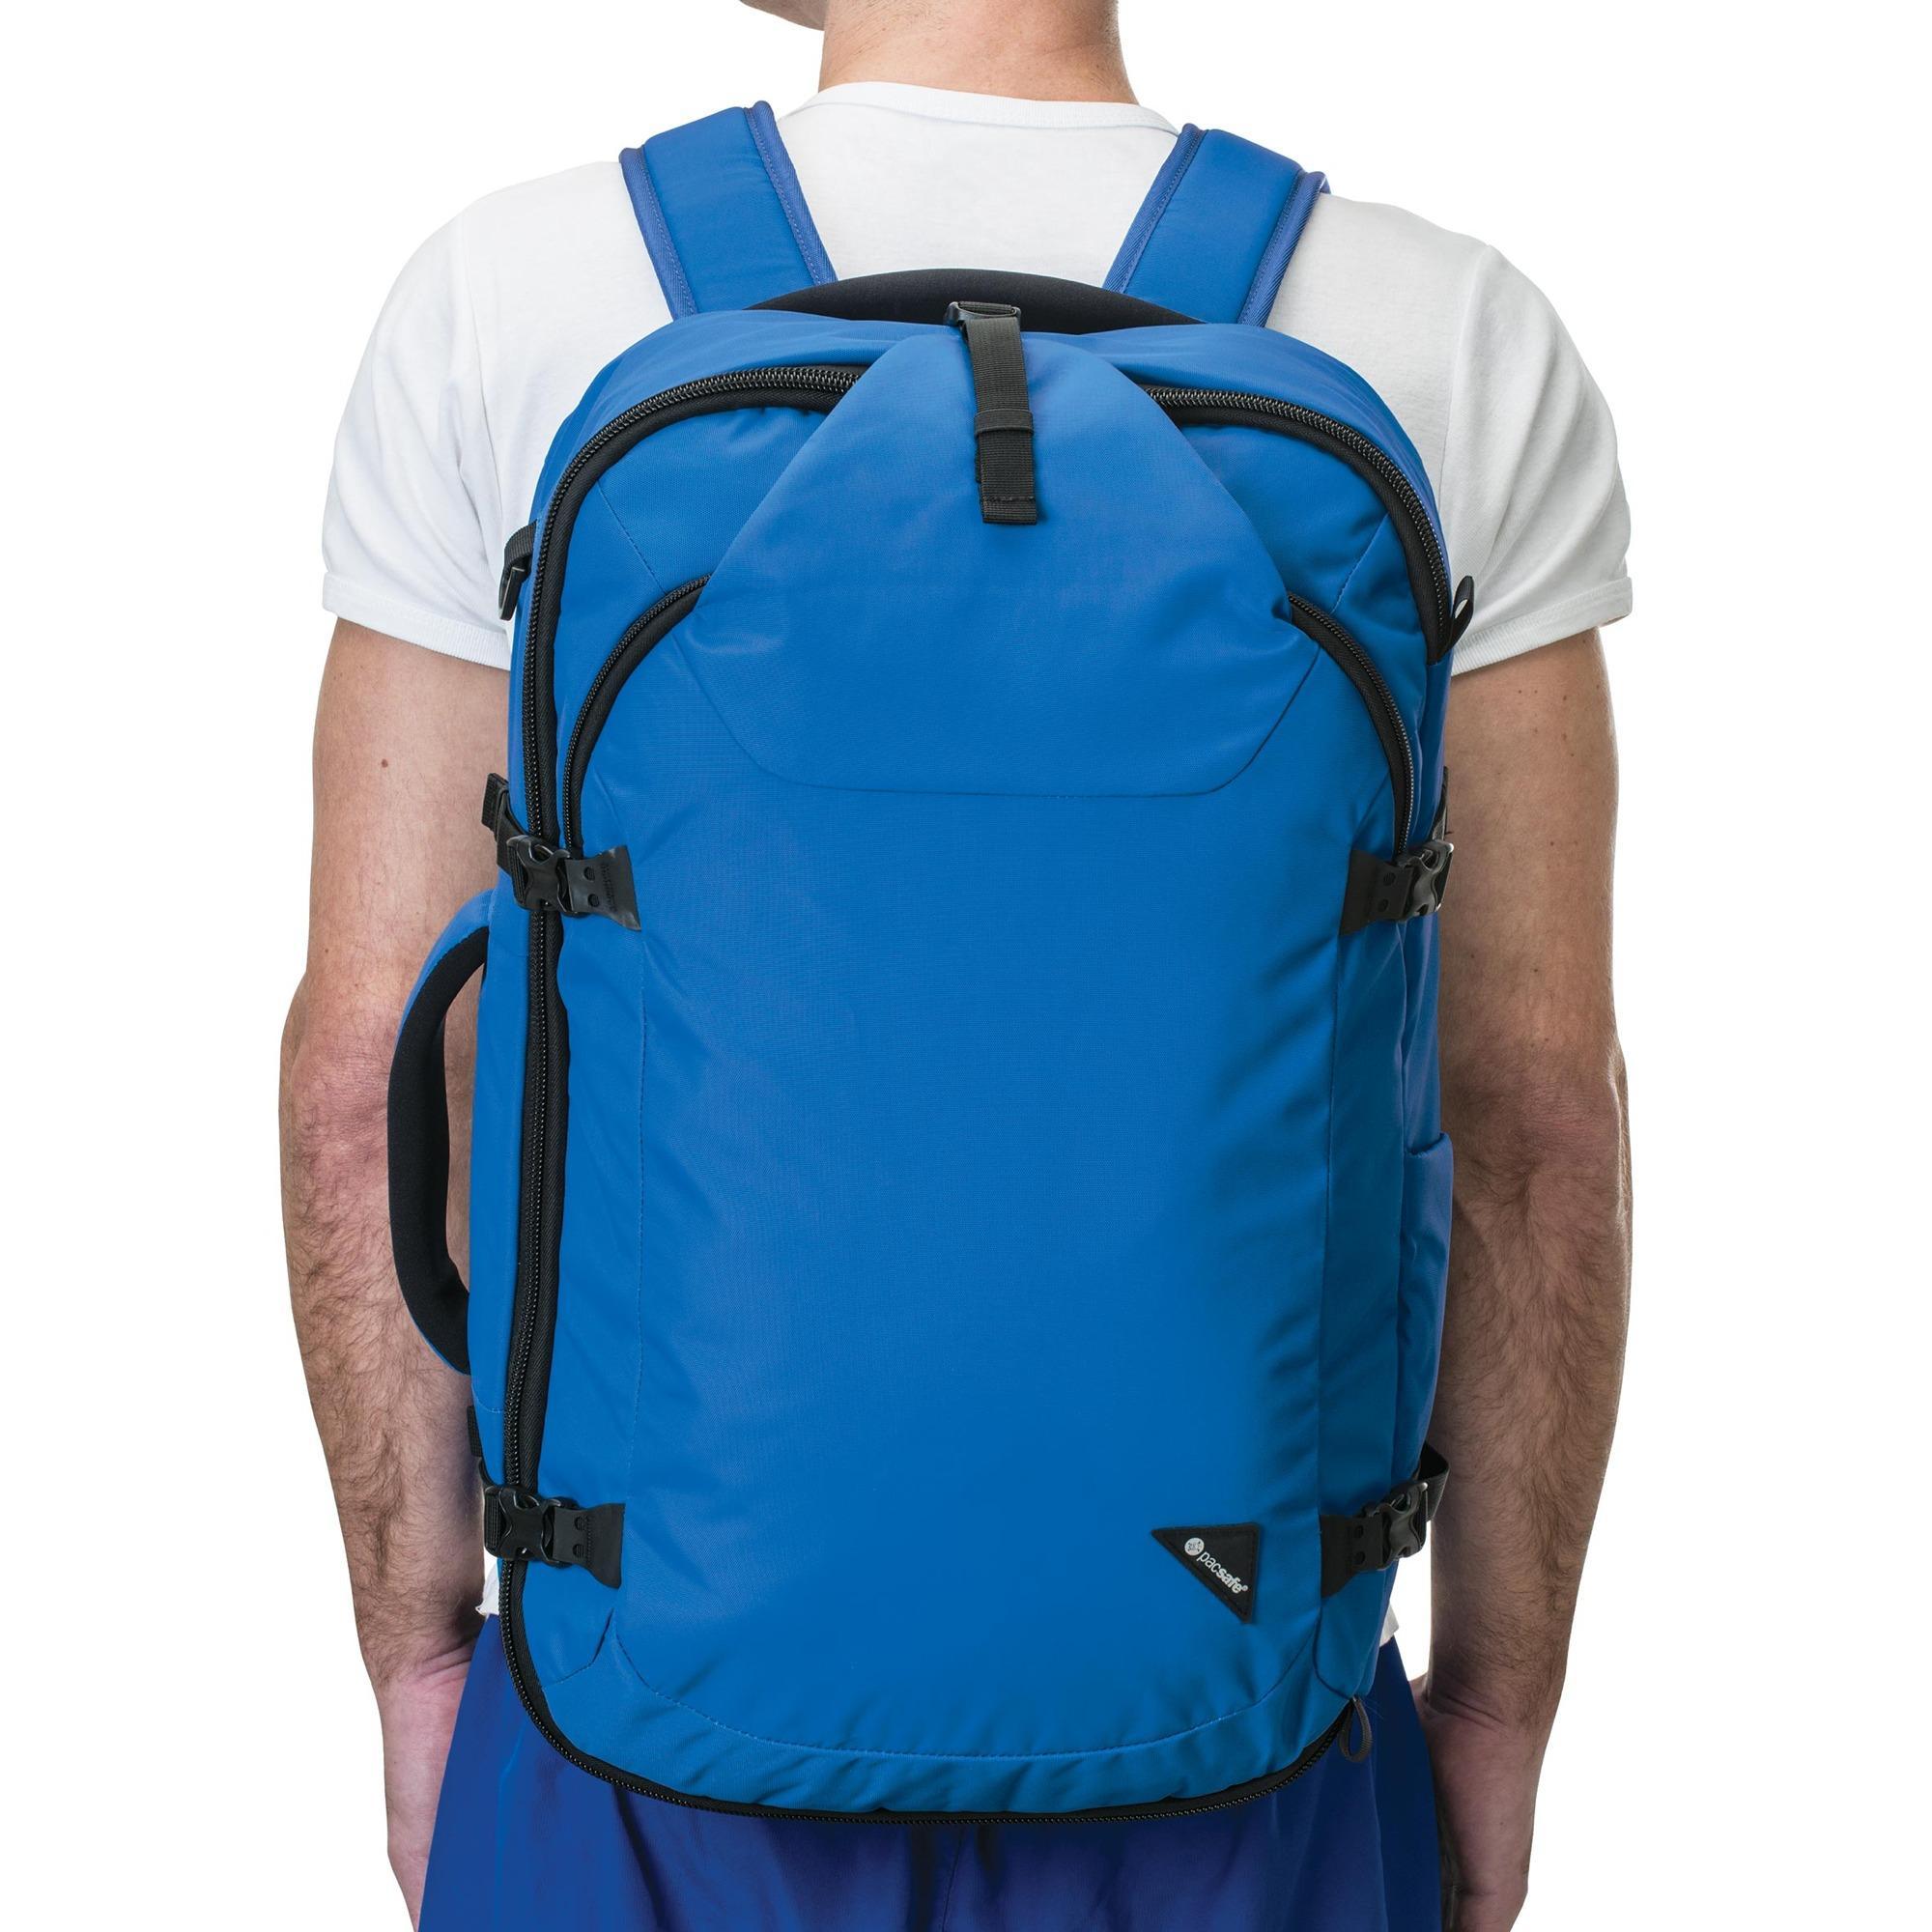 Amazon.com  Pacsafe Venturesafe EXP45 Anti-Theft Carry-On Travel ... 8cd50048f7c35